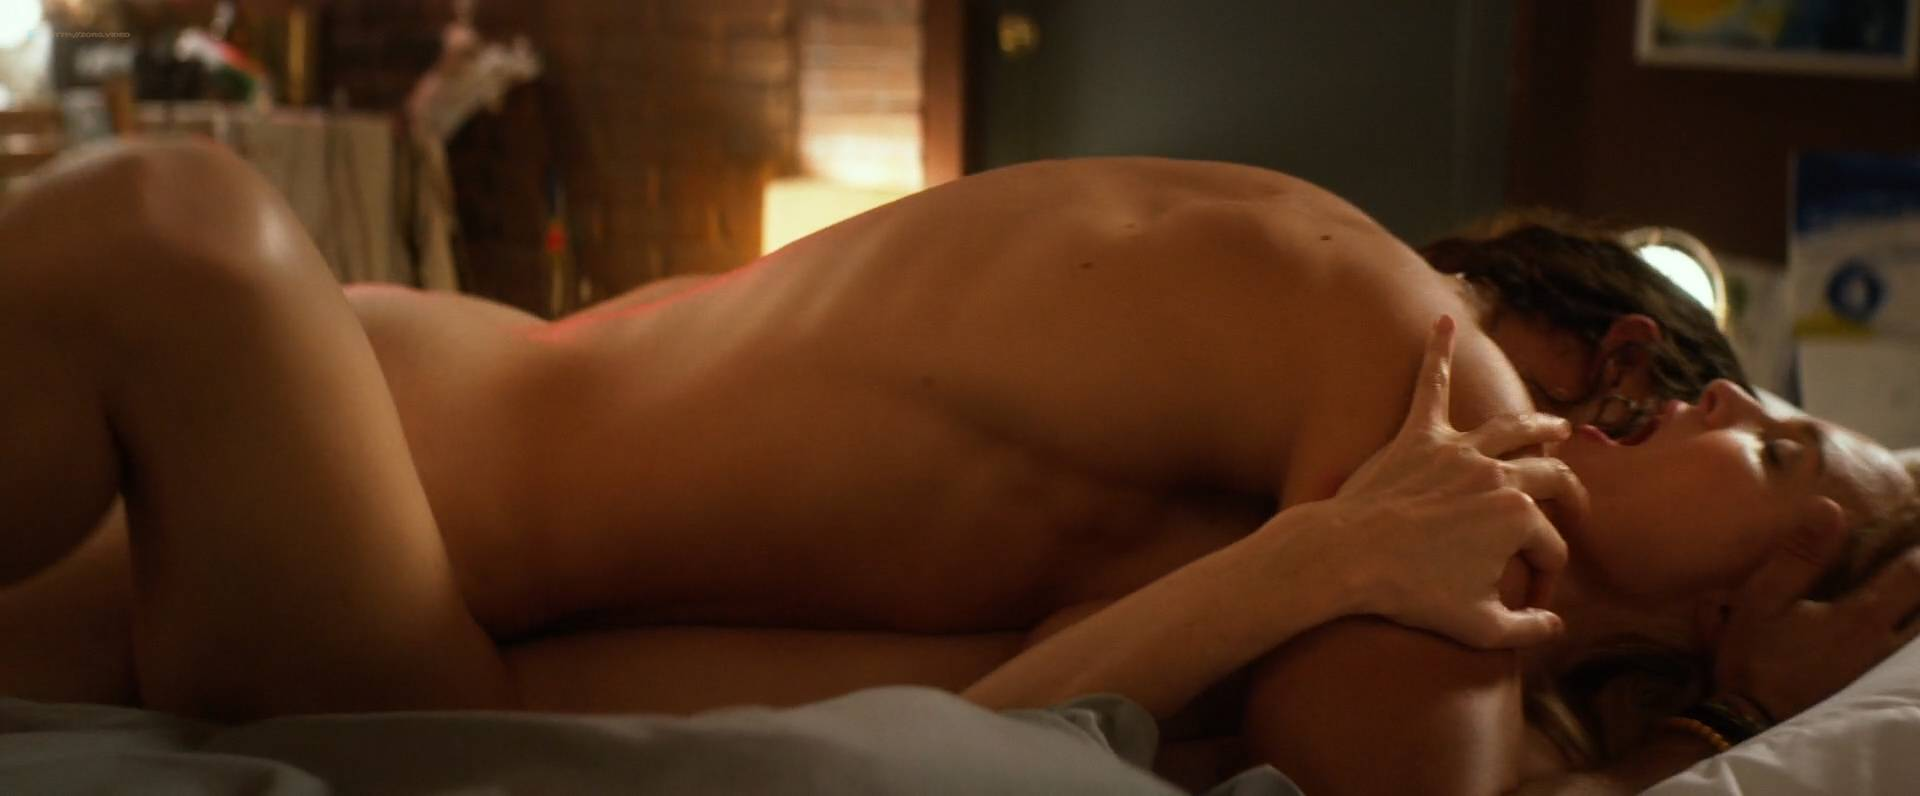 Heather-Graham-nude-sex-Angela-Kinsey-nude-butt-Stephanie-Beatriz-hot-Half-Magic-2018-HD-1080p-005.jpg